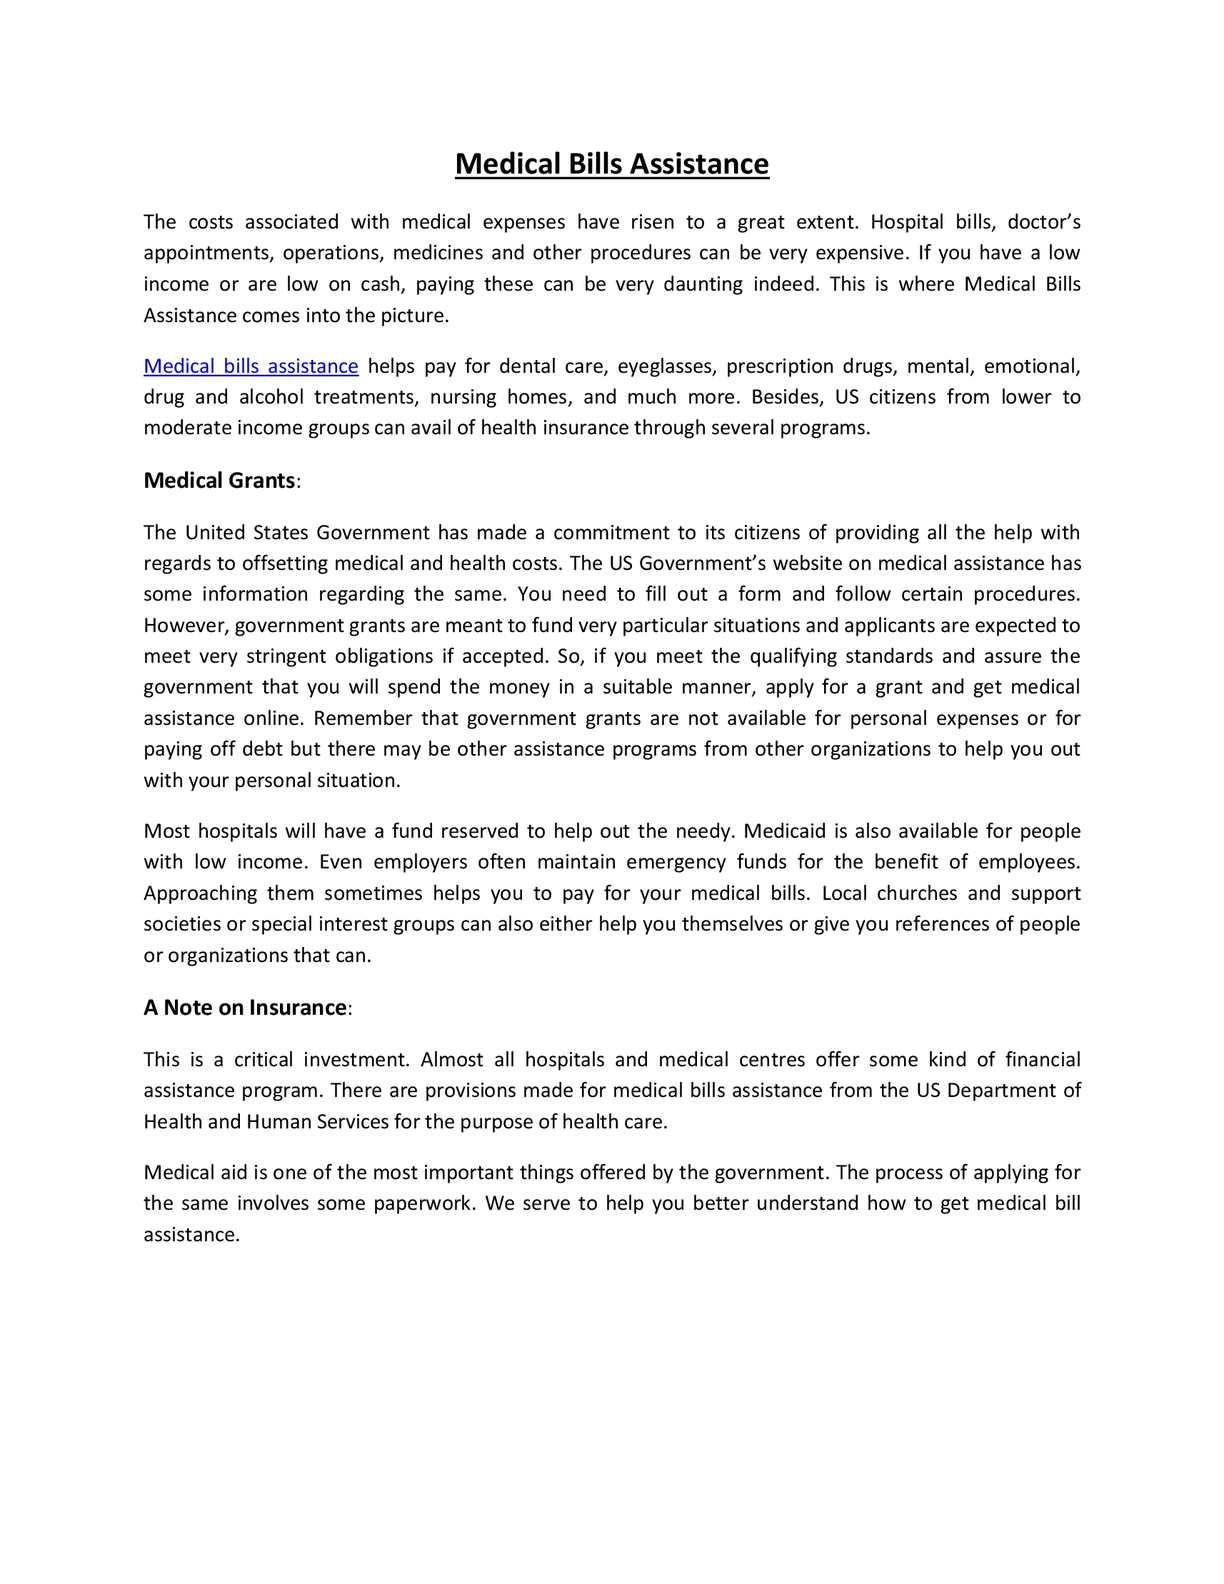 calaméo - governmentgrants - medical bills assistance